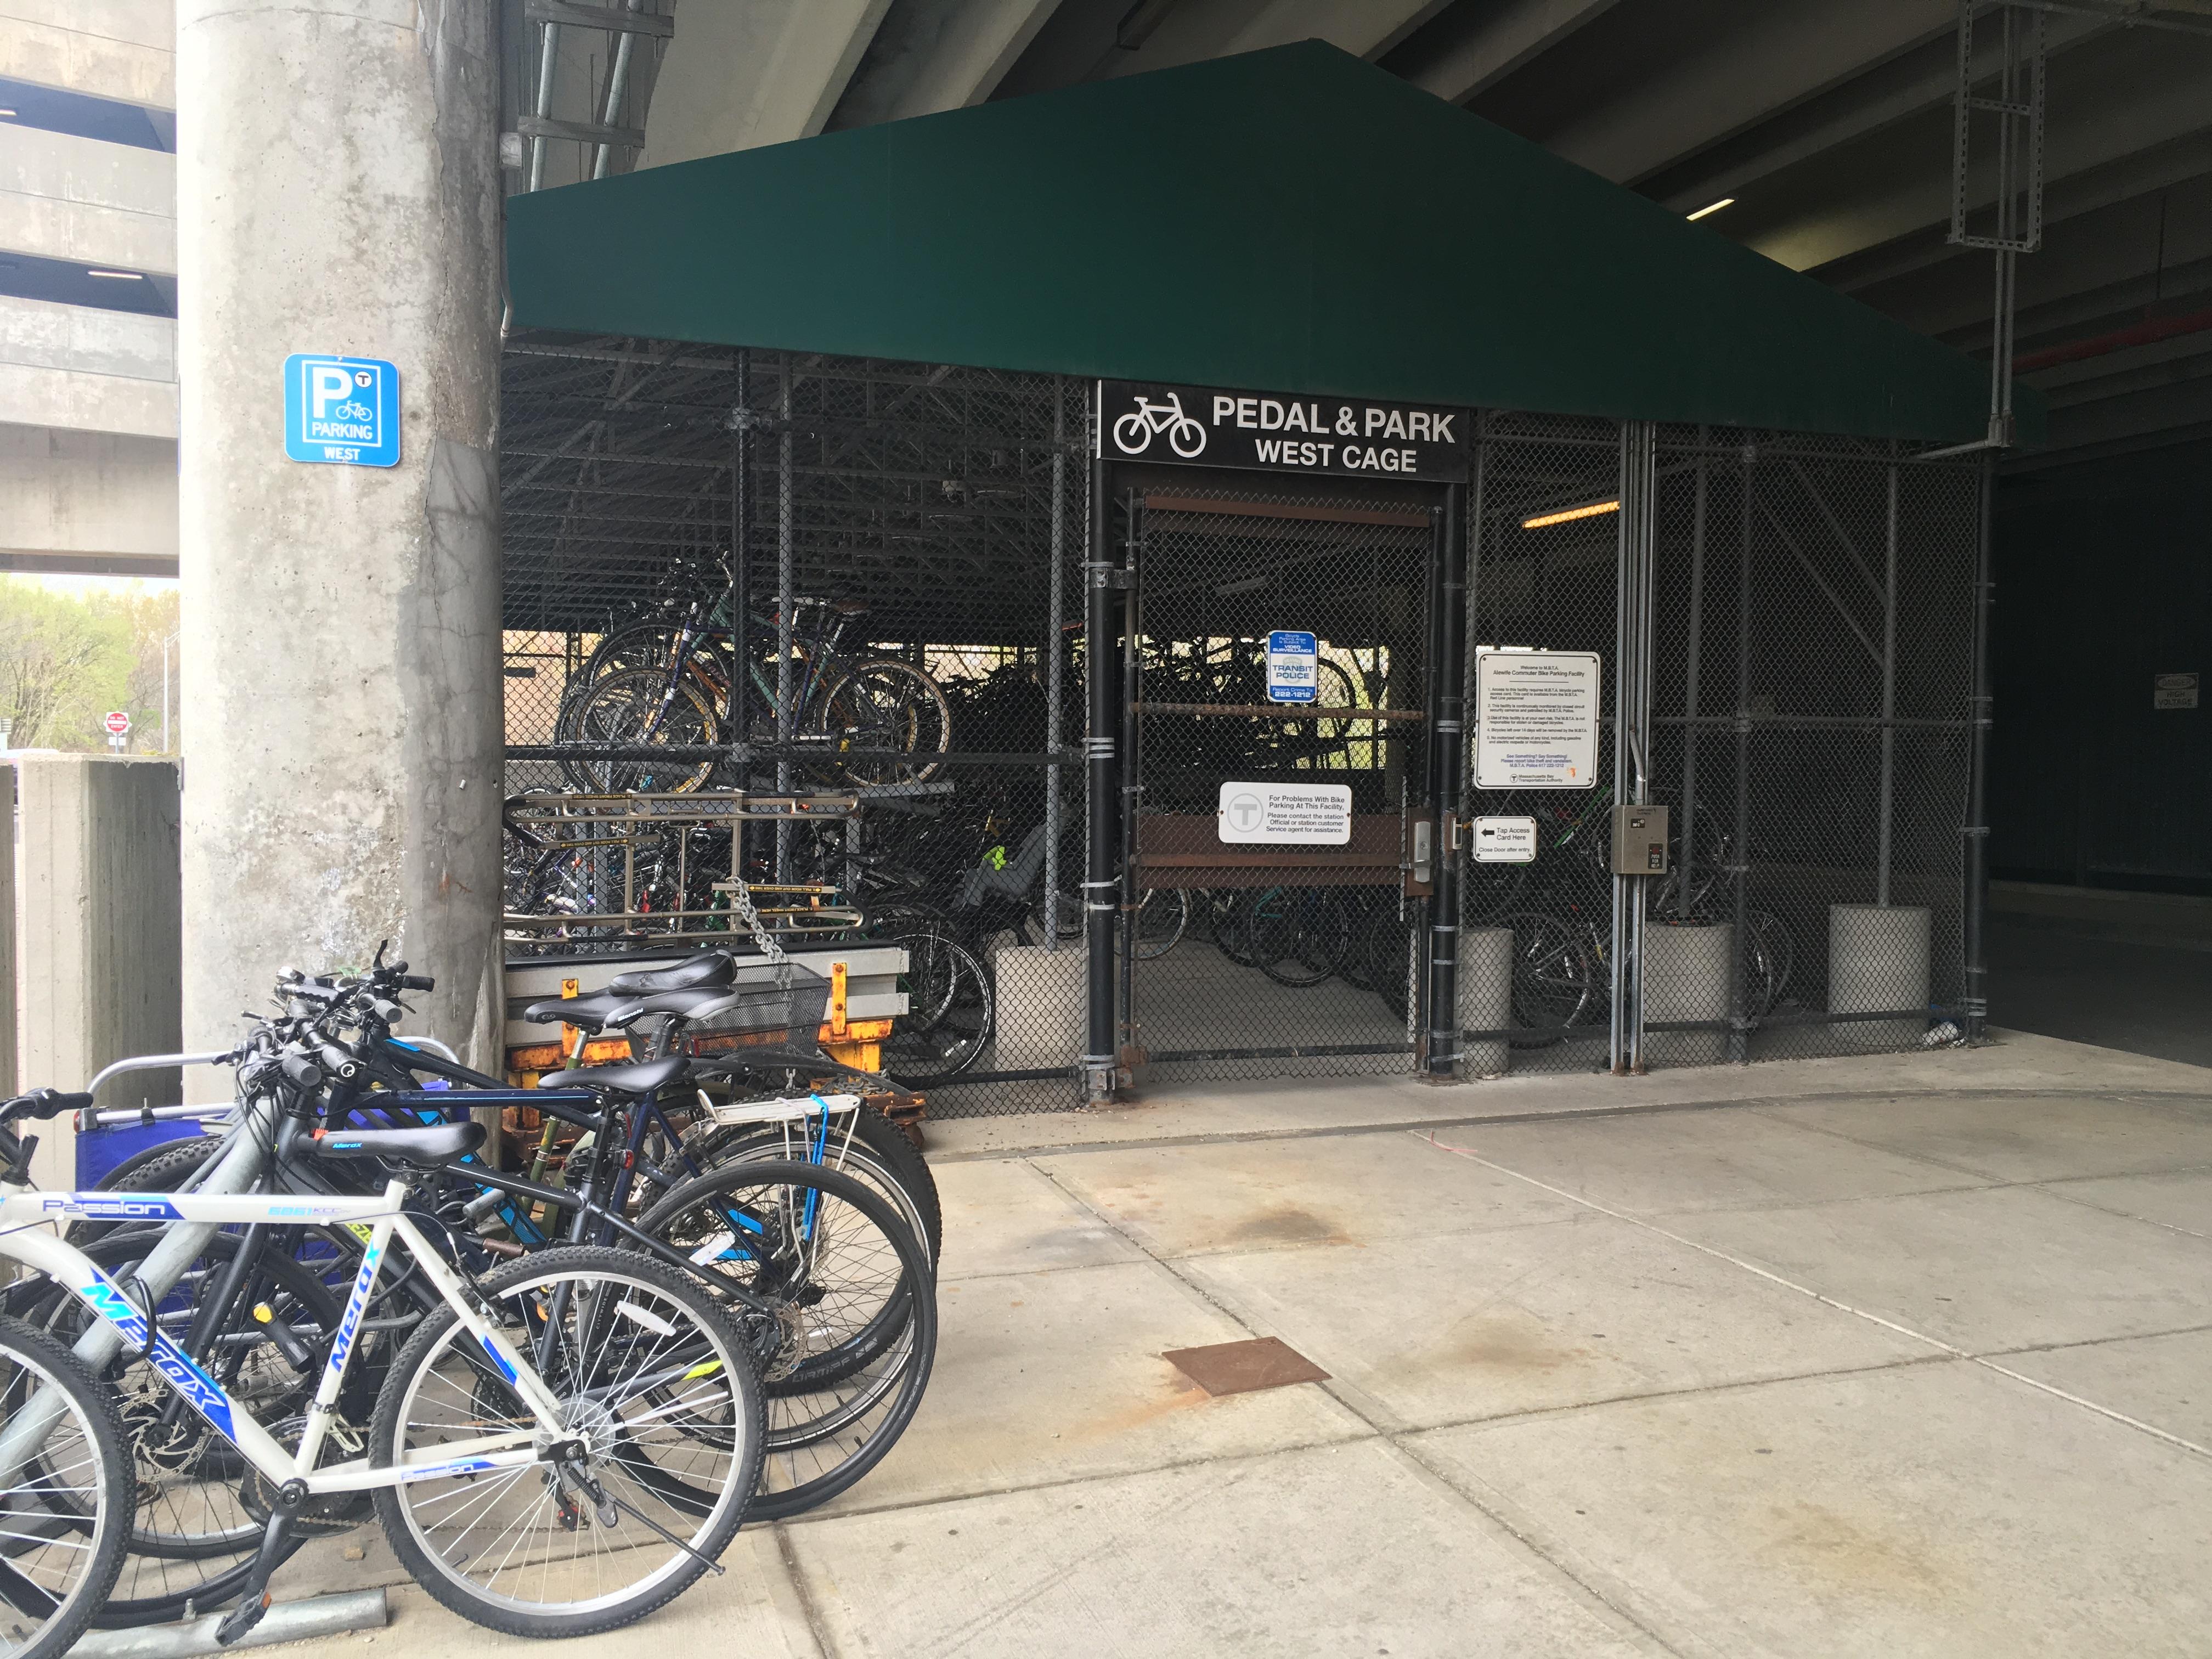 Alewife Bike Cage photo by Christina MilNeil Streetsblog Mass